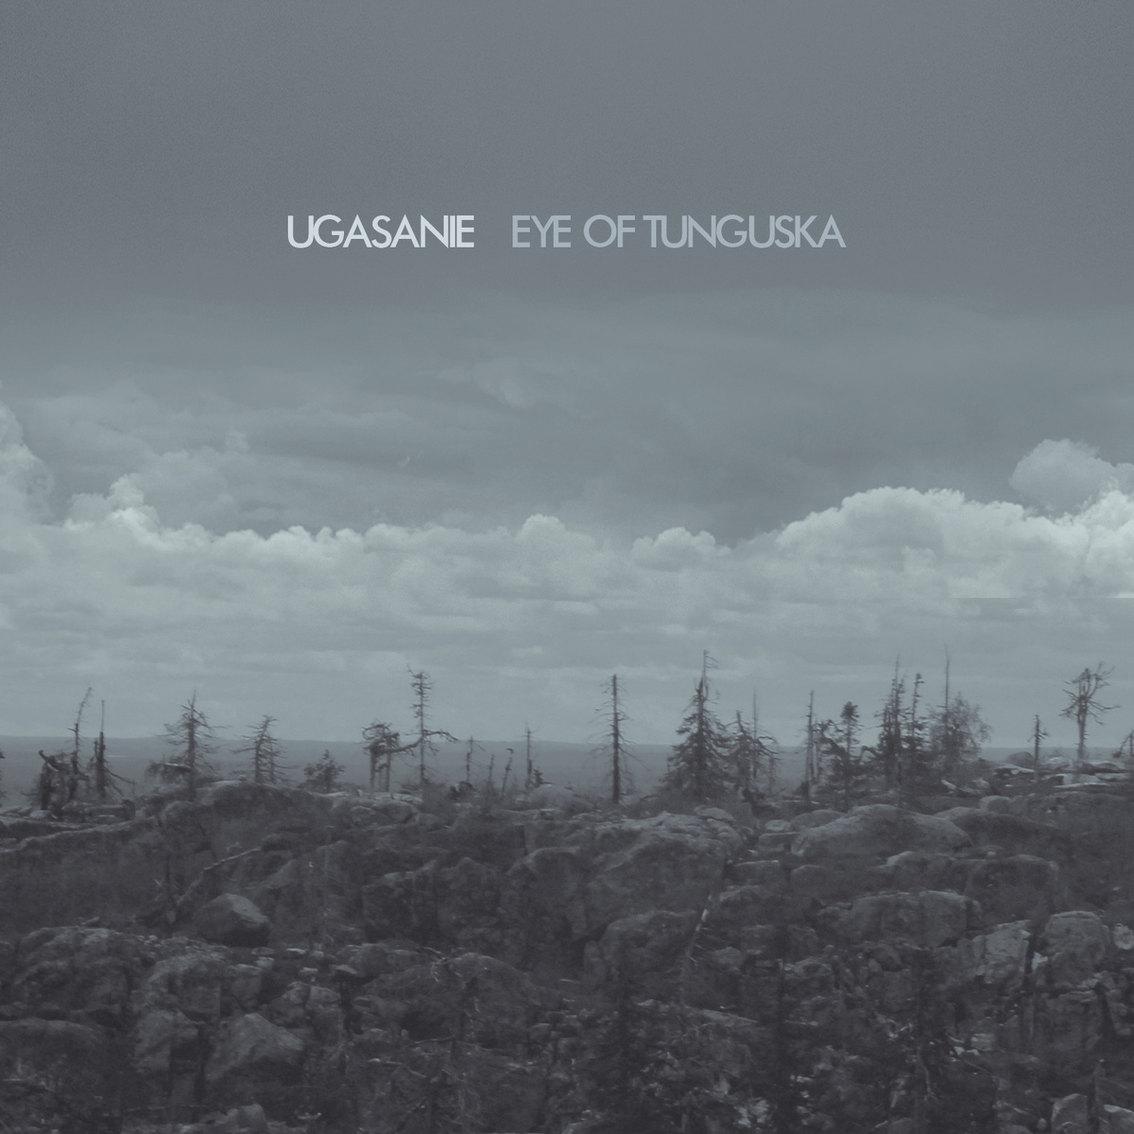 3rd Ugasanie album 'Eye of Tunguska' available for pre-order via Cryo Chamber